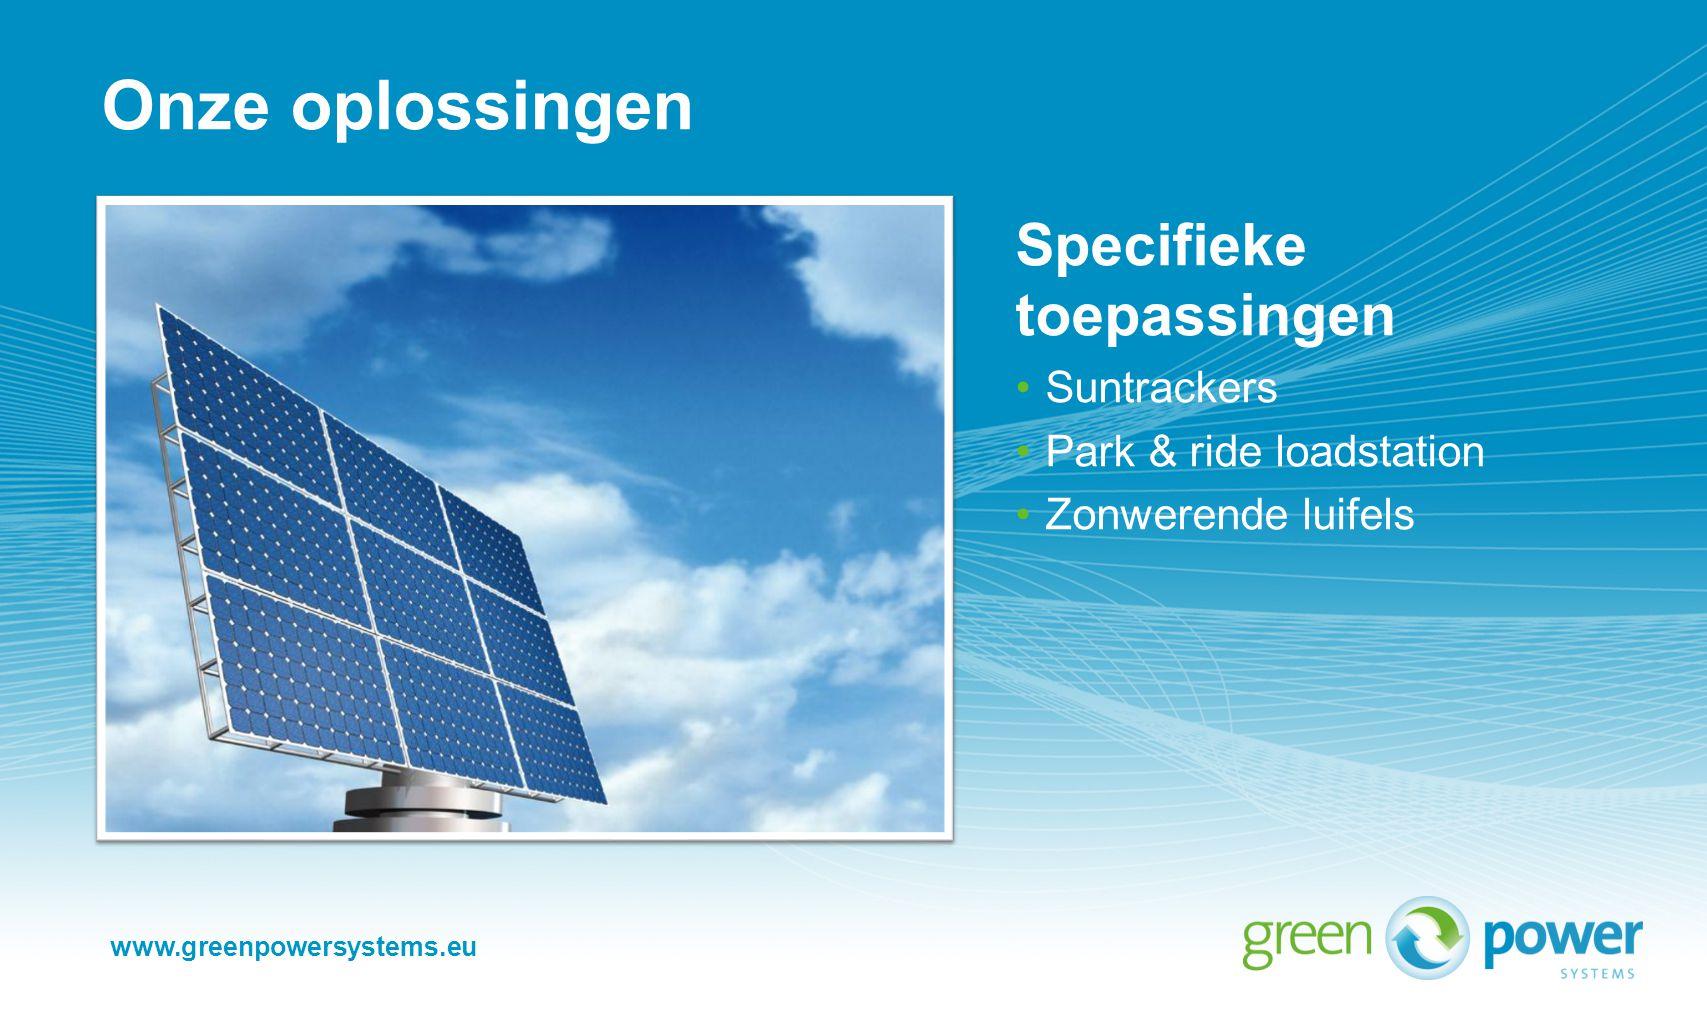 Meer informatie: Green Power Systems Beegderveld 5, 6099 NC Beegden Postbus 5050, 6097 ZH Heel T.